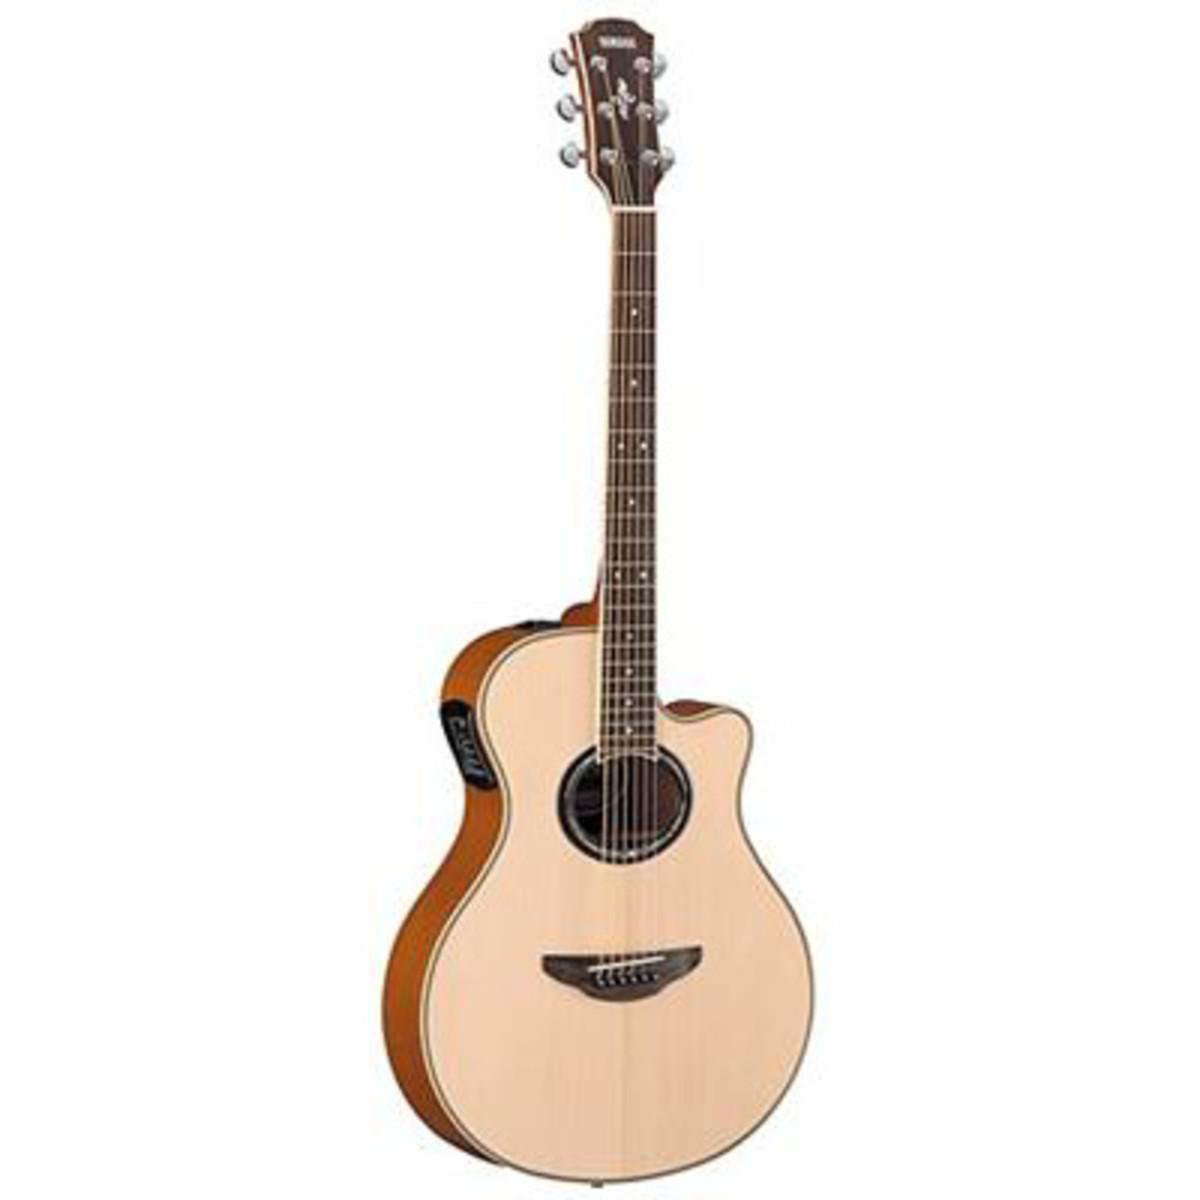 puis yamaha apx700 guitare electro acoustique. Black Bedroom Furniture Sets. Home Design Ideas